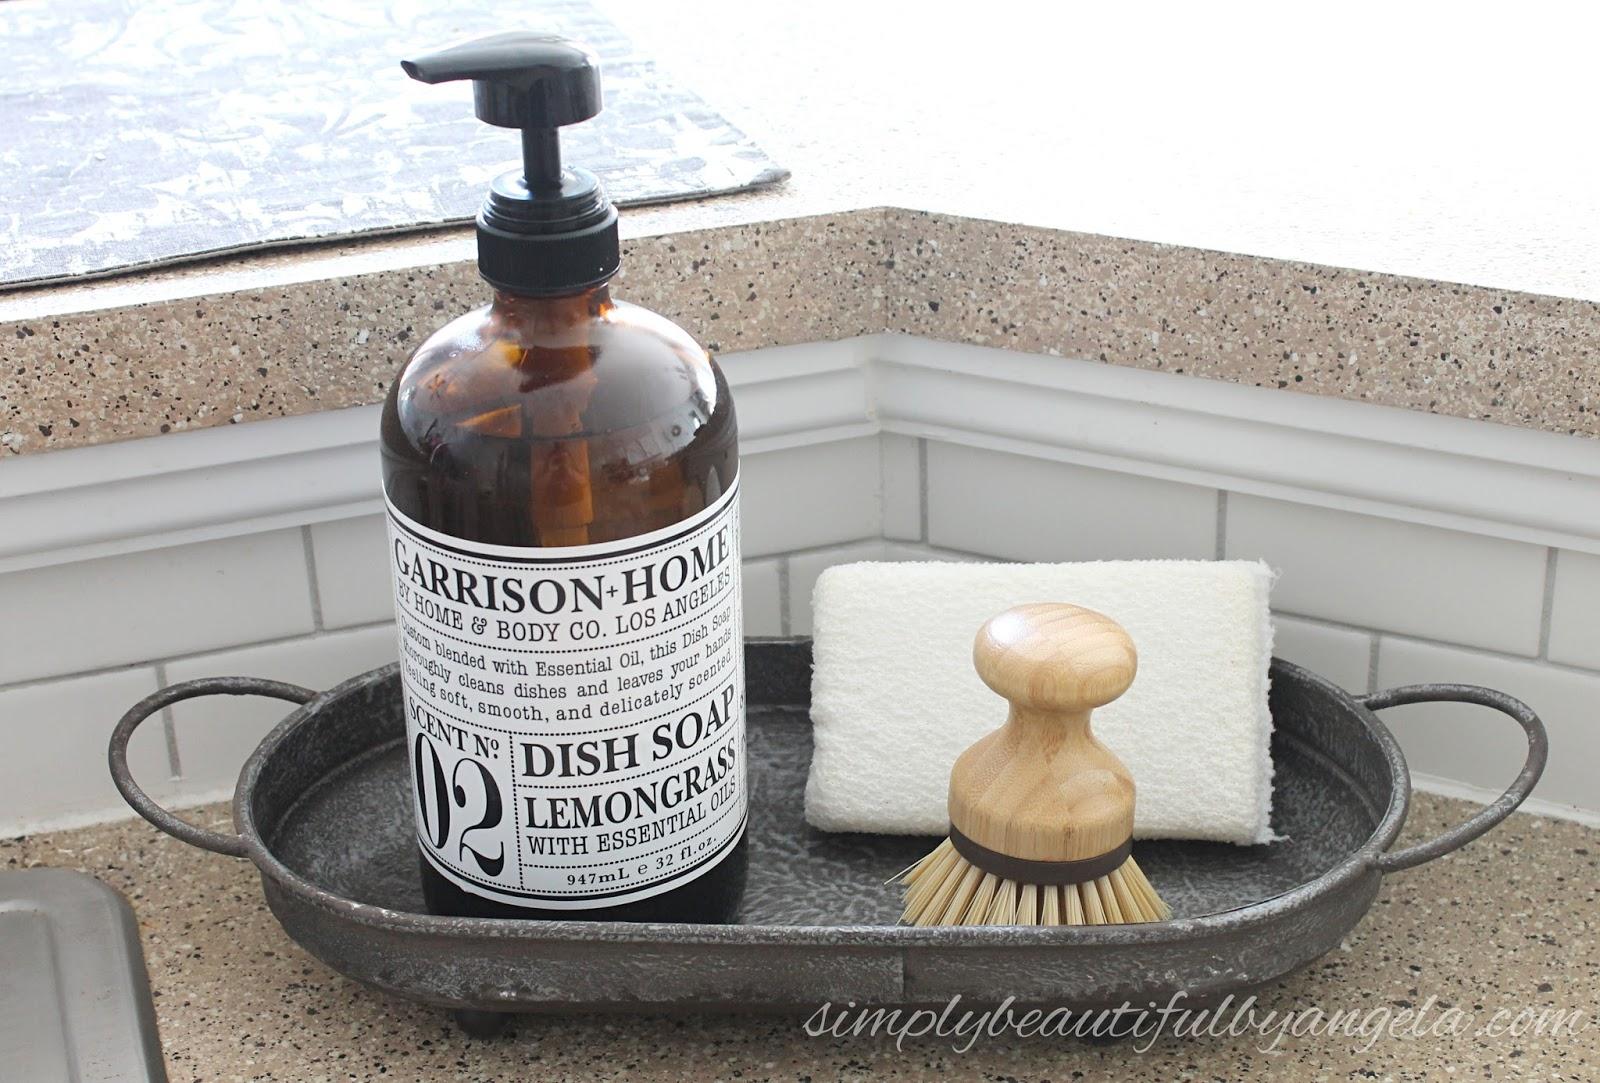 Beautiful Kitchen Dish Soap Photo - Interior Design Ideas & Home ...